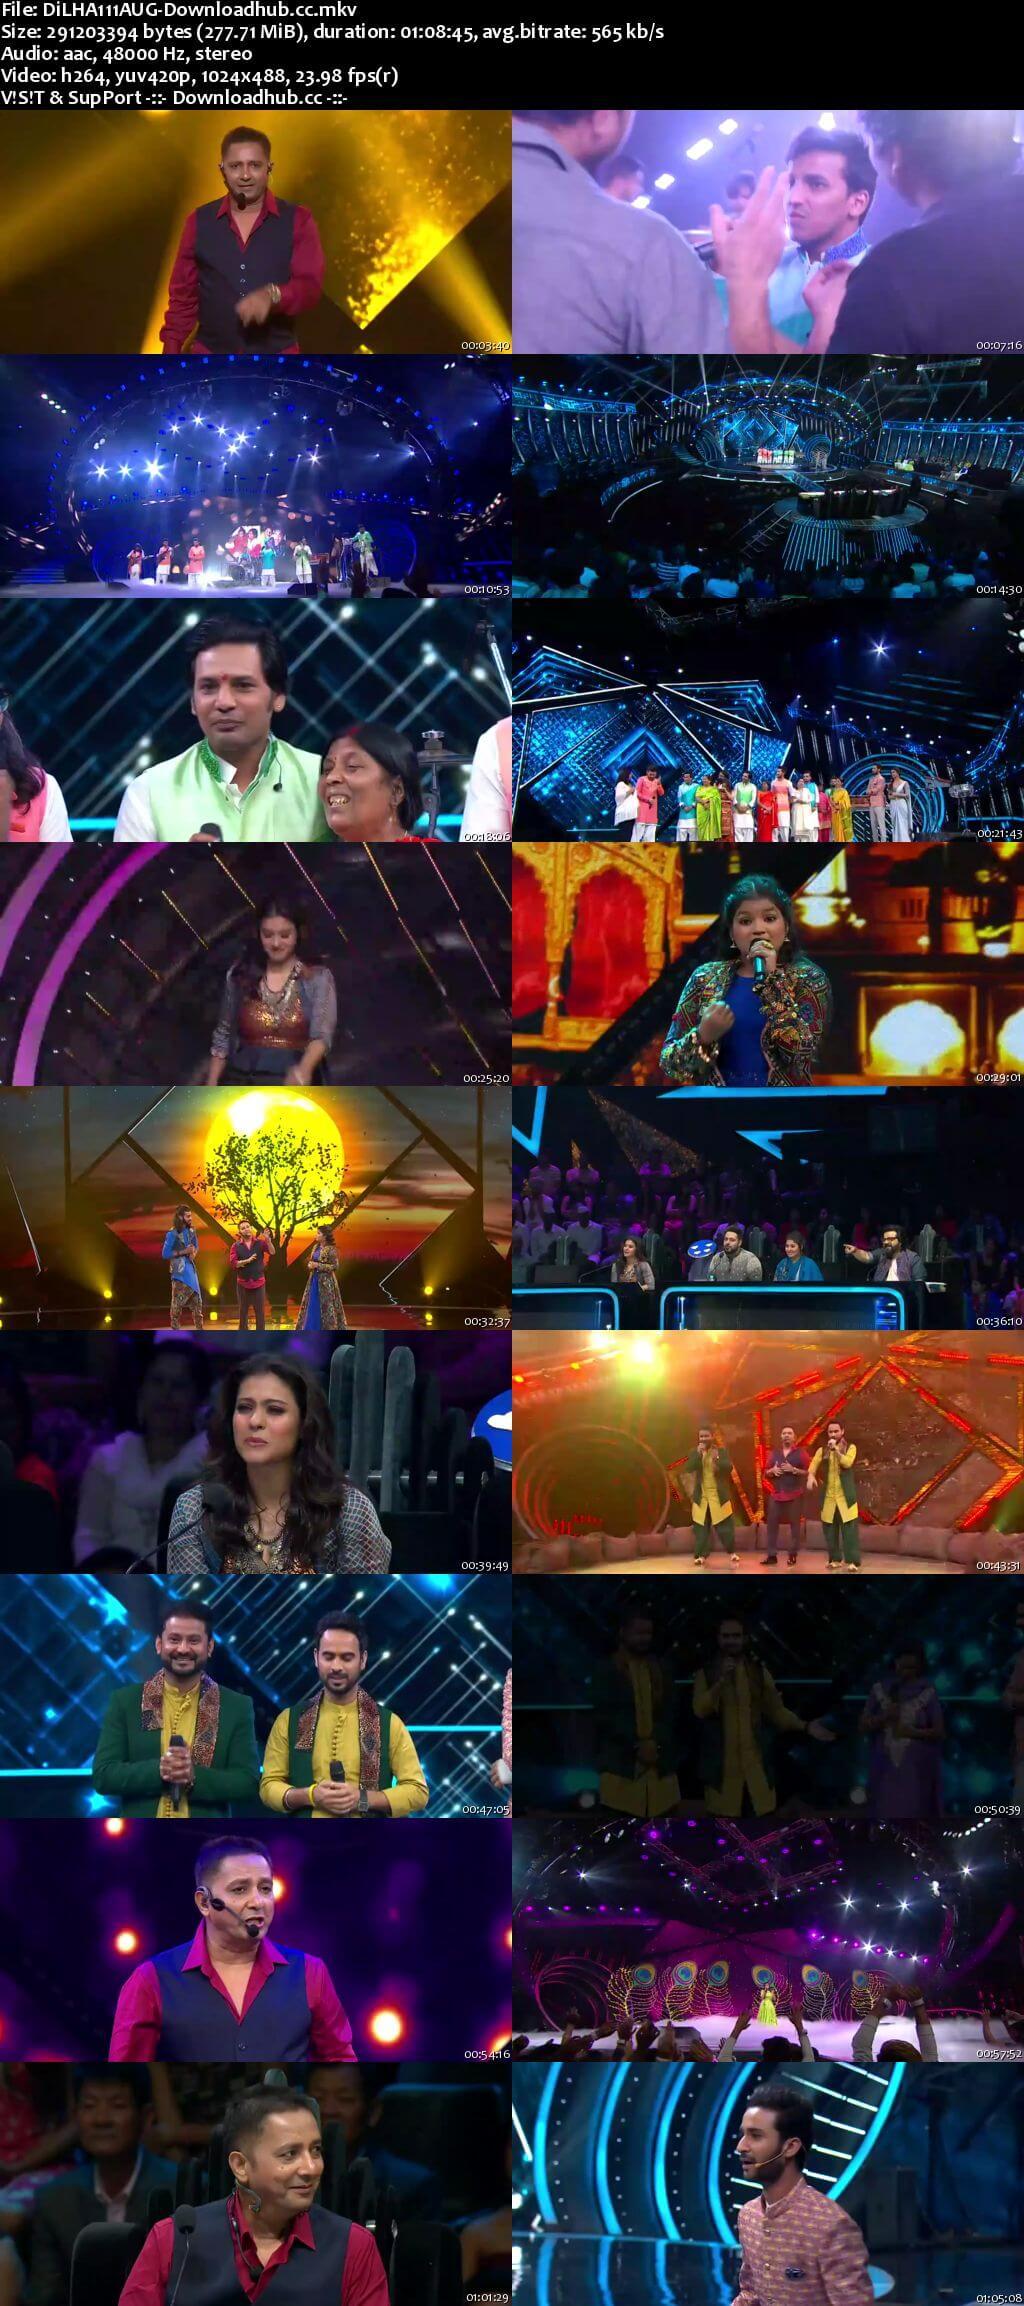 Dil Hai Hindustani 2 11 August 2018 Episode 11 HDTV 480p